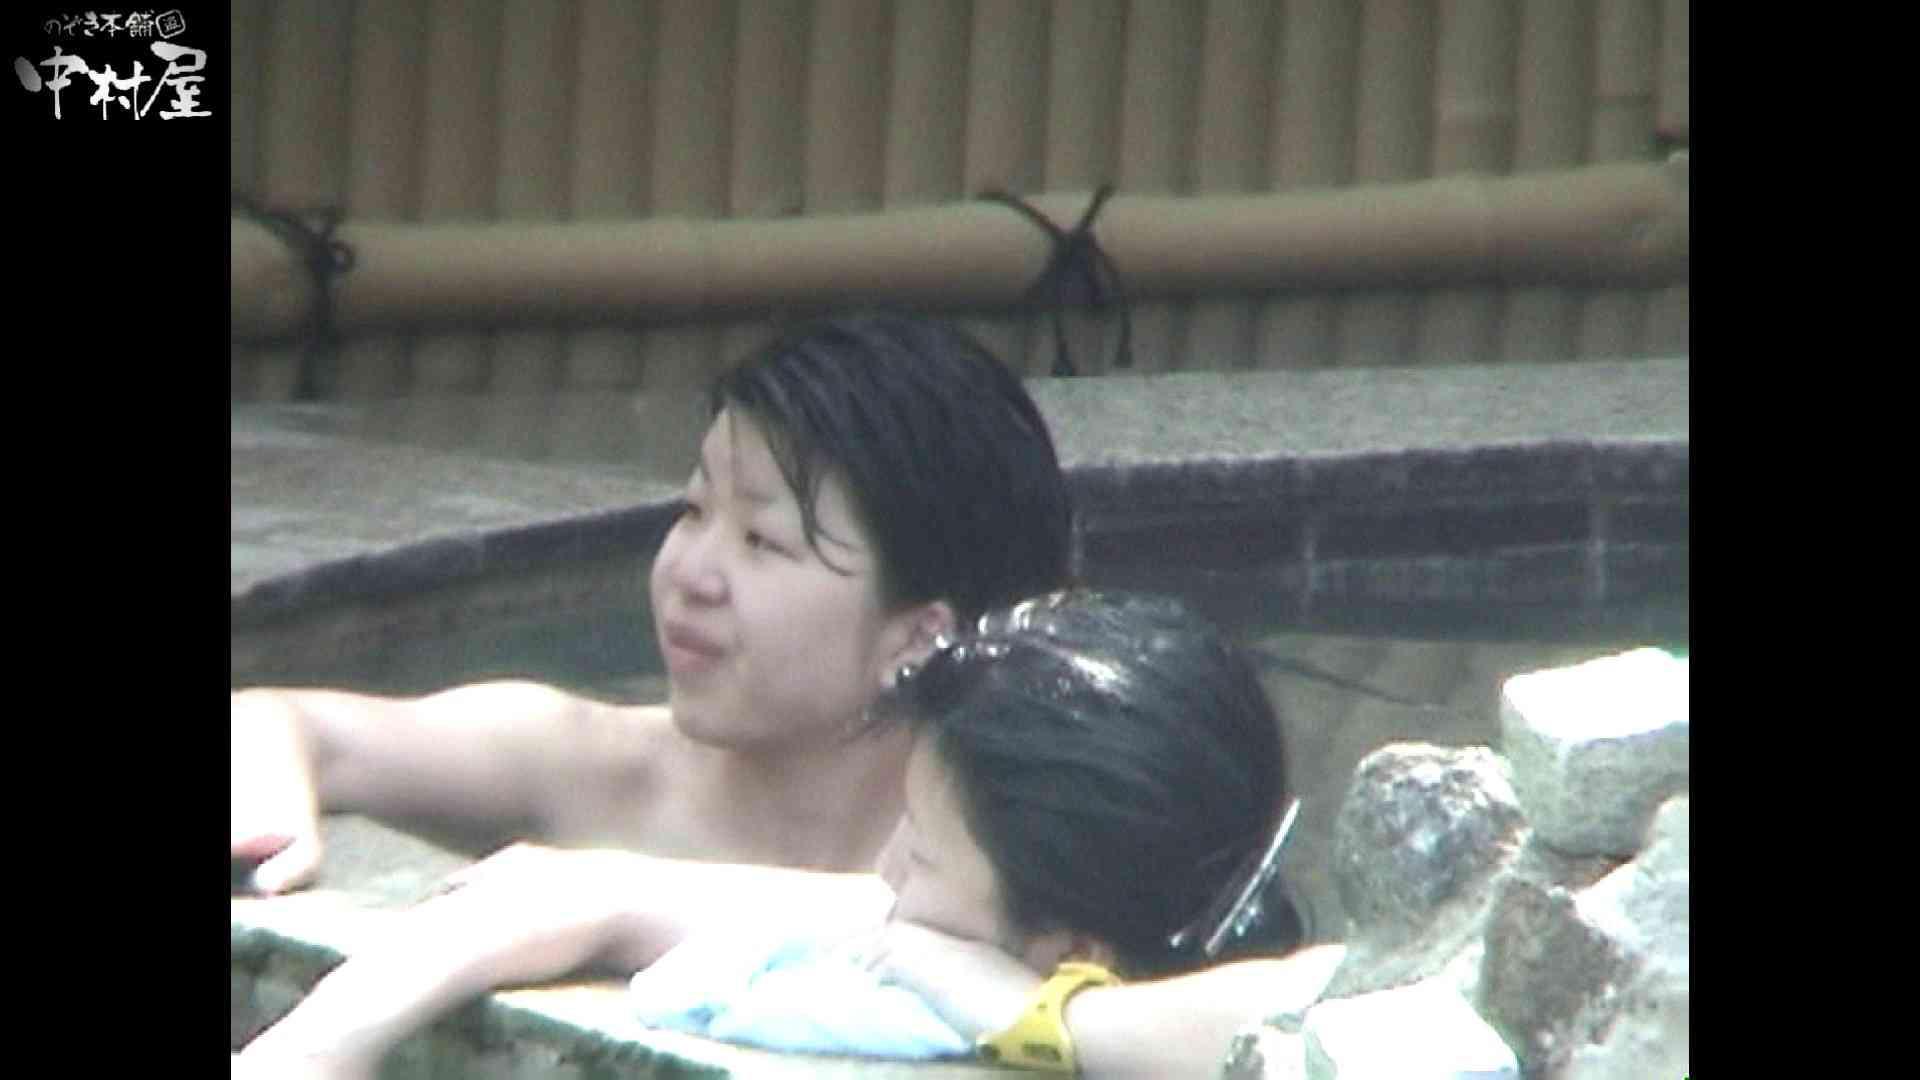 Aquaな露天風呂Vol.936 盗撮シリーズ | 露天風呂編  90PIX 29